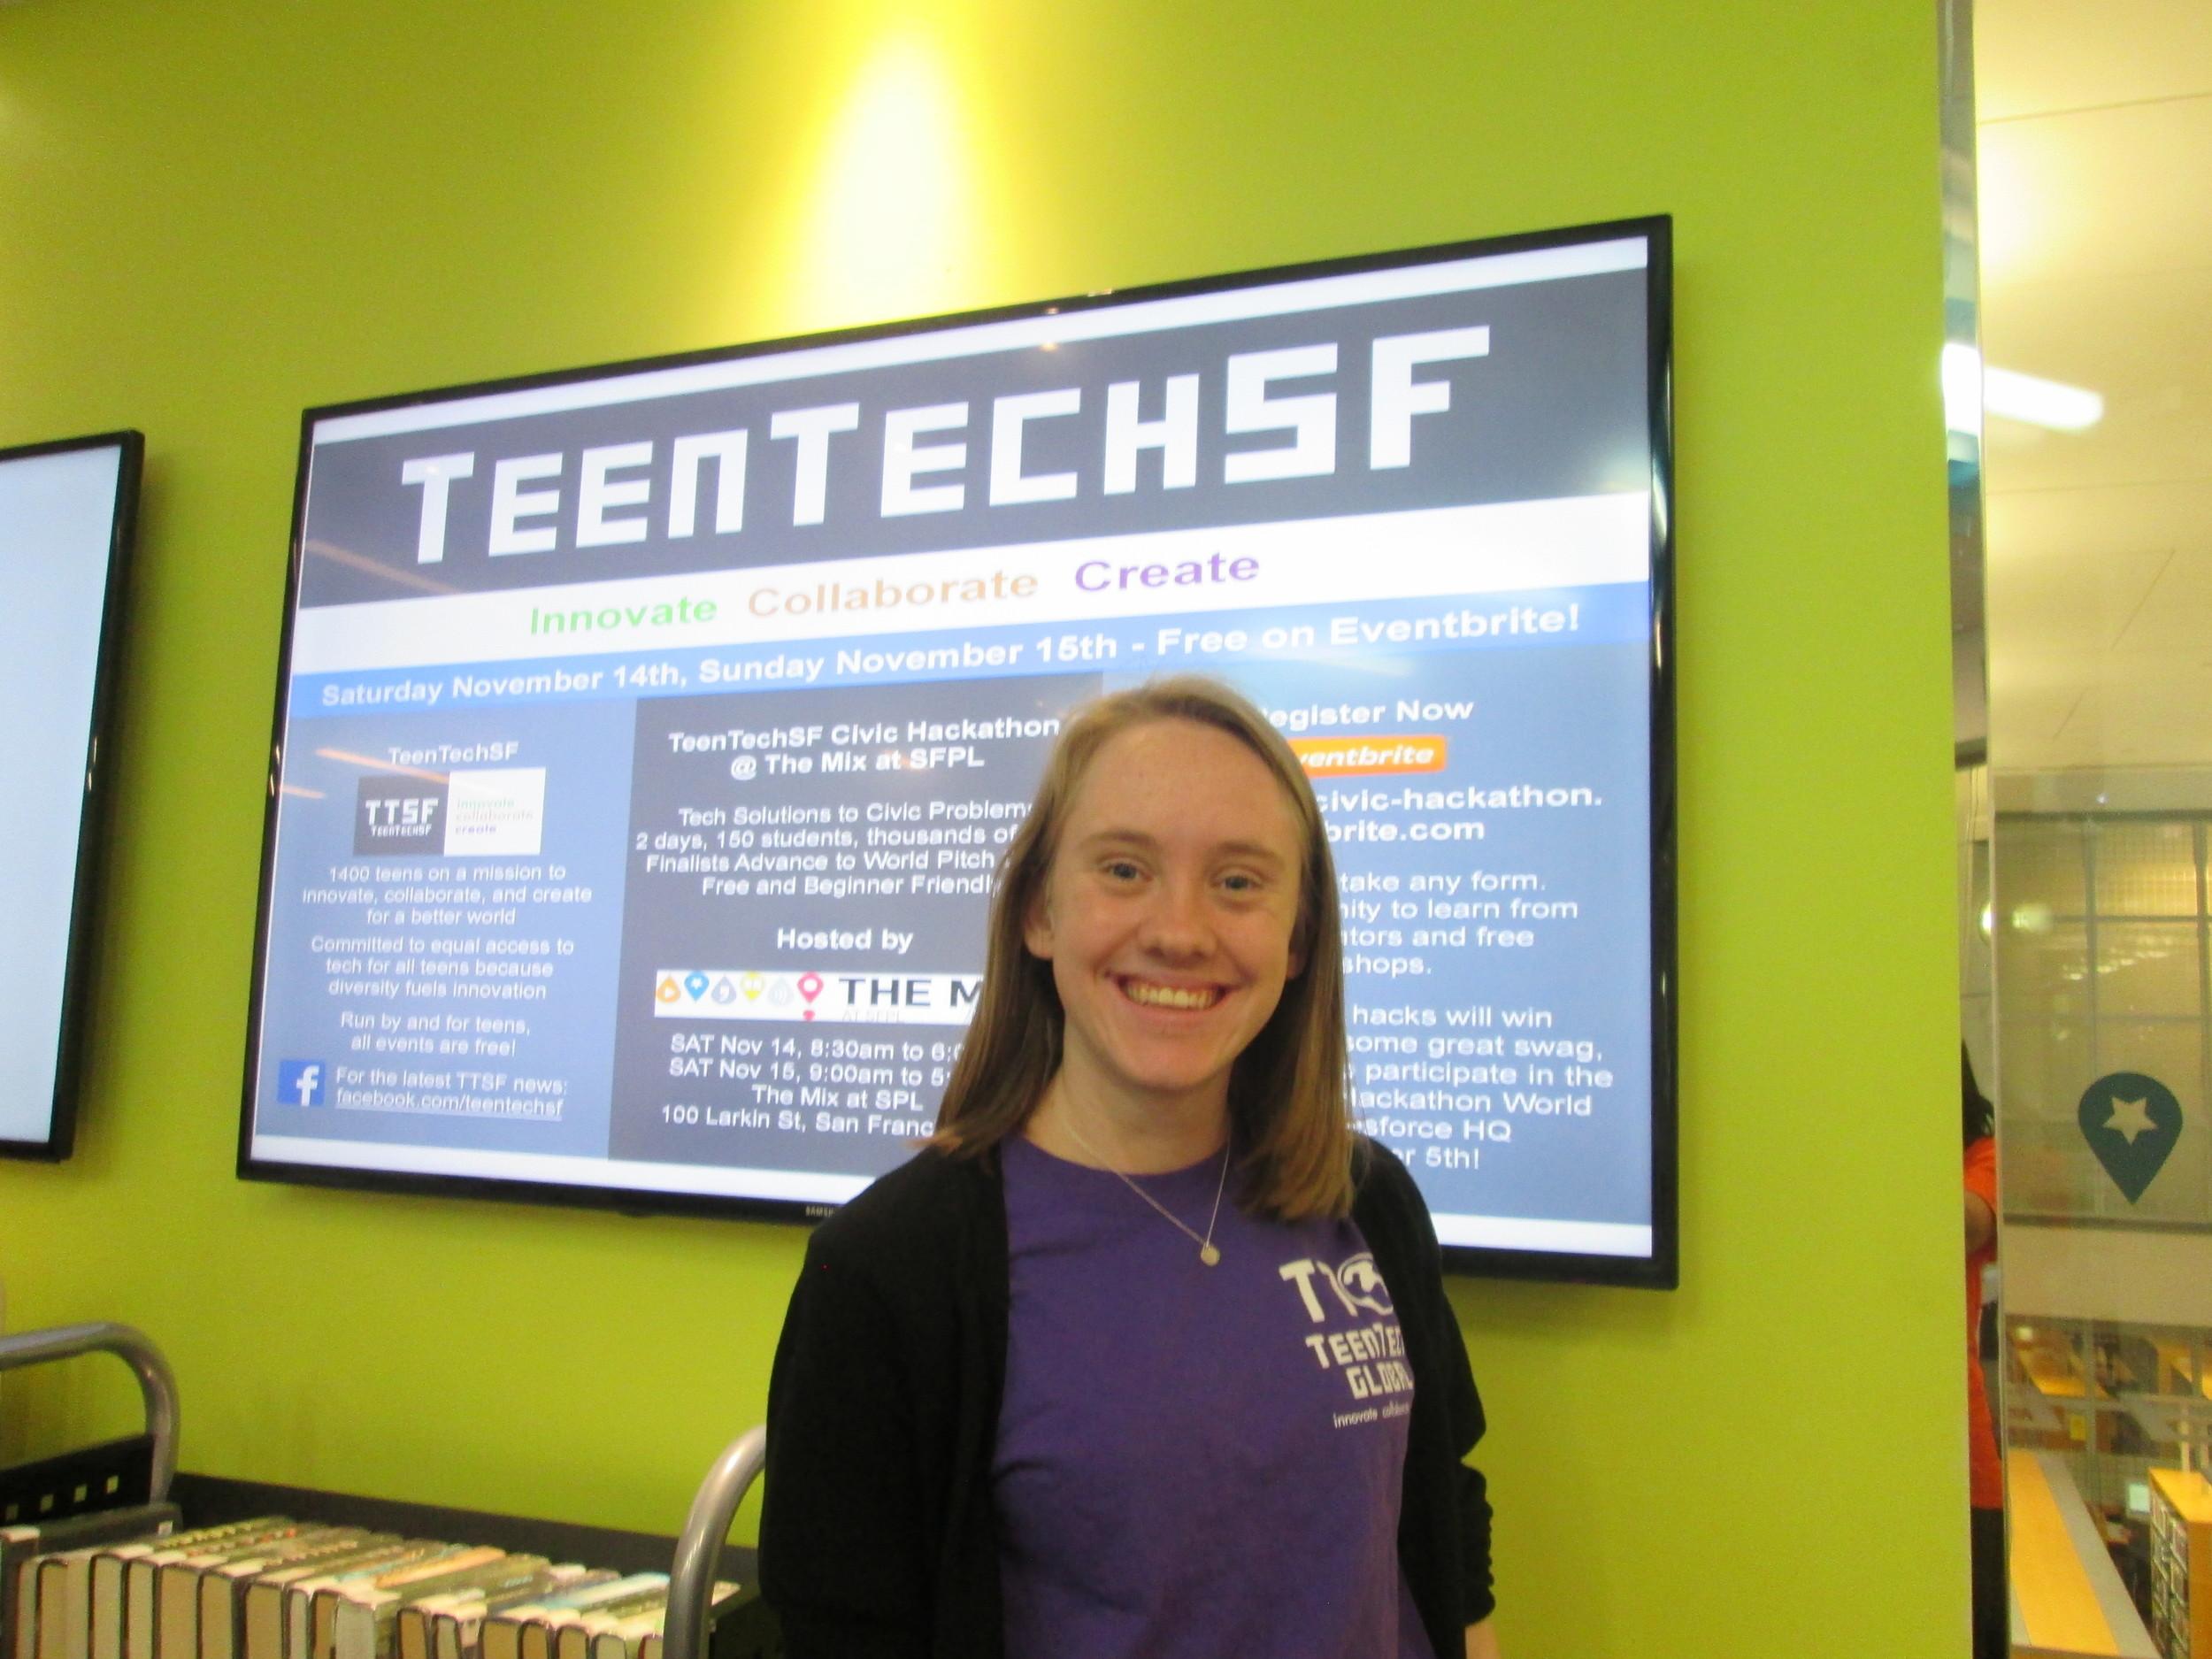 TeenTechSF Leader Sara Fay live-tweeting #TTSFCivicHack